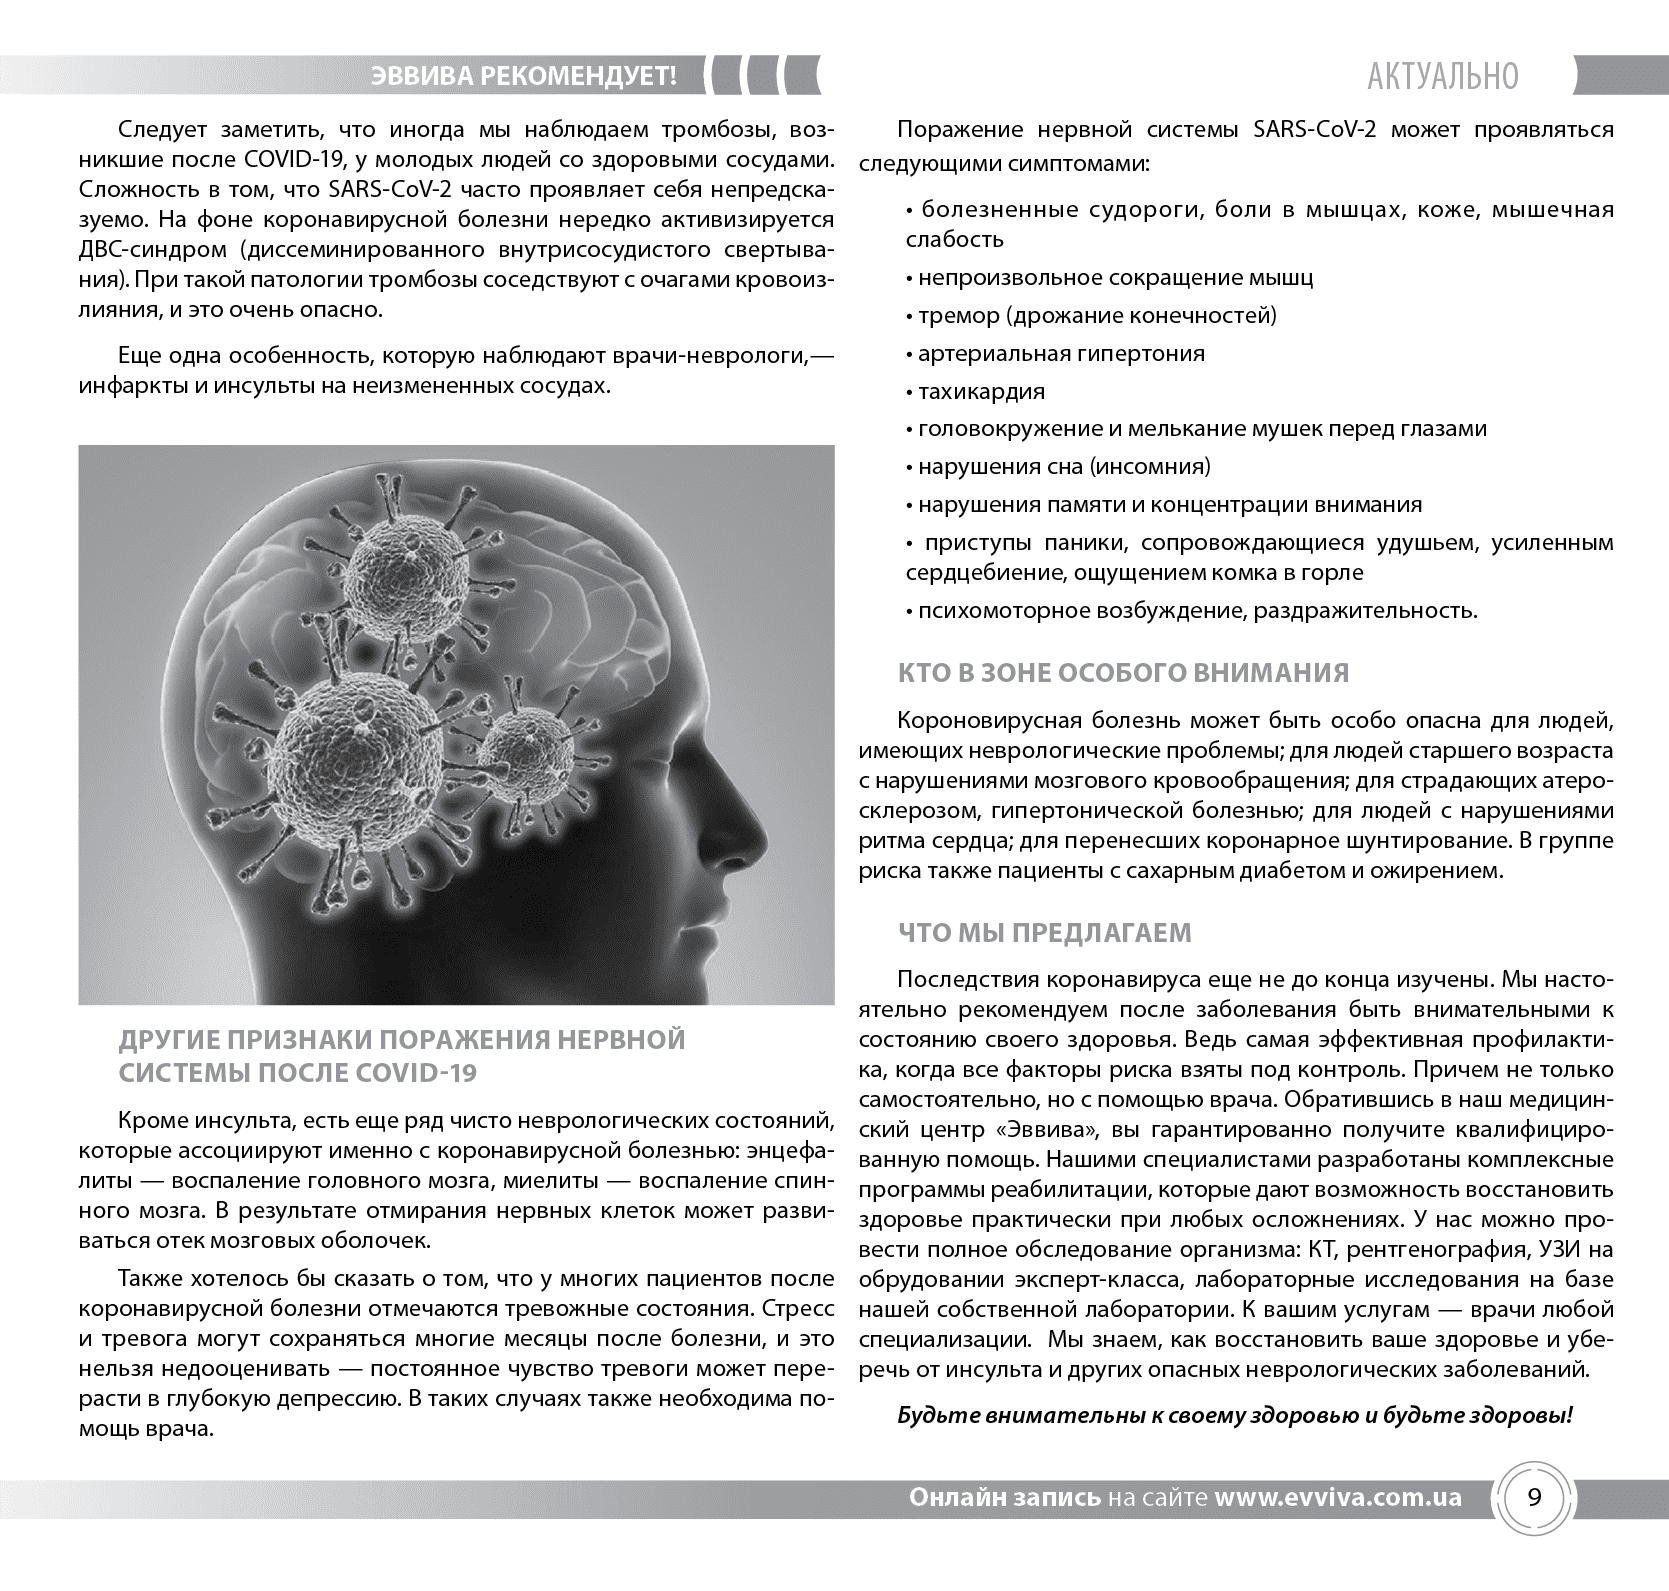 evviva-zhurnal-118-page9